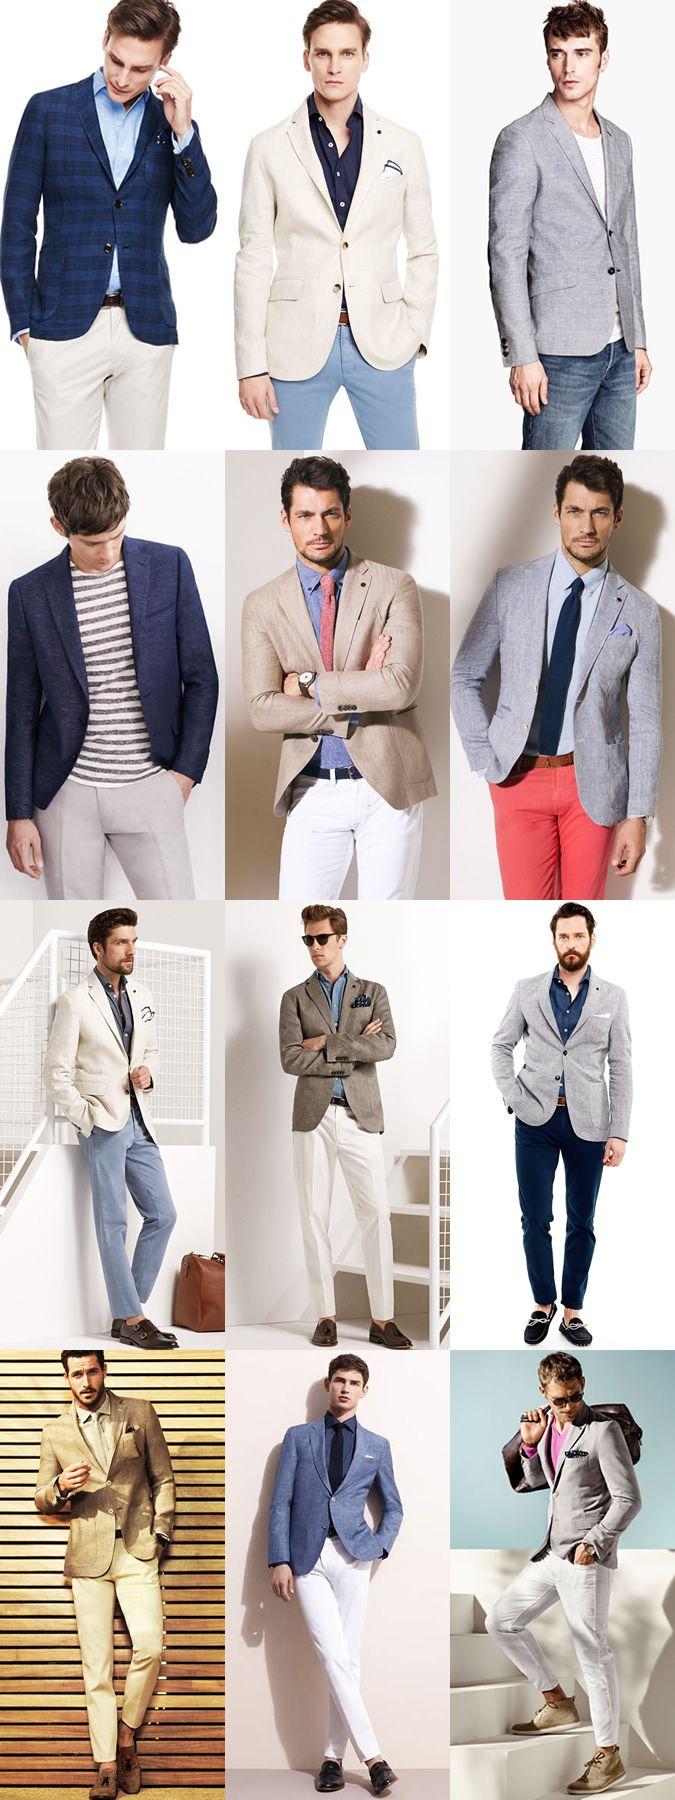 High Summer Style: The Linen Separates -The Blazer Lookbook